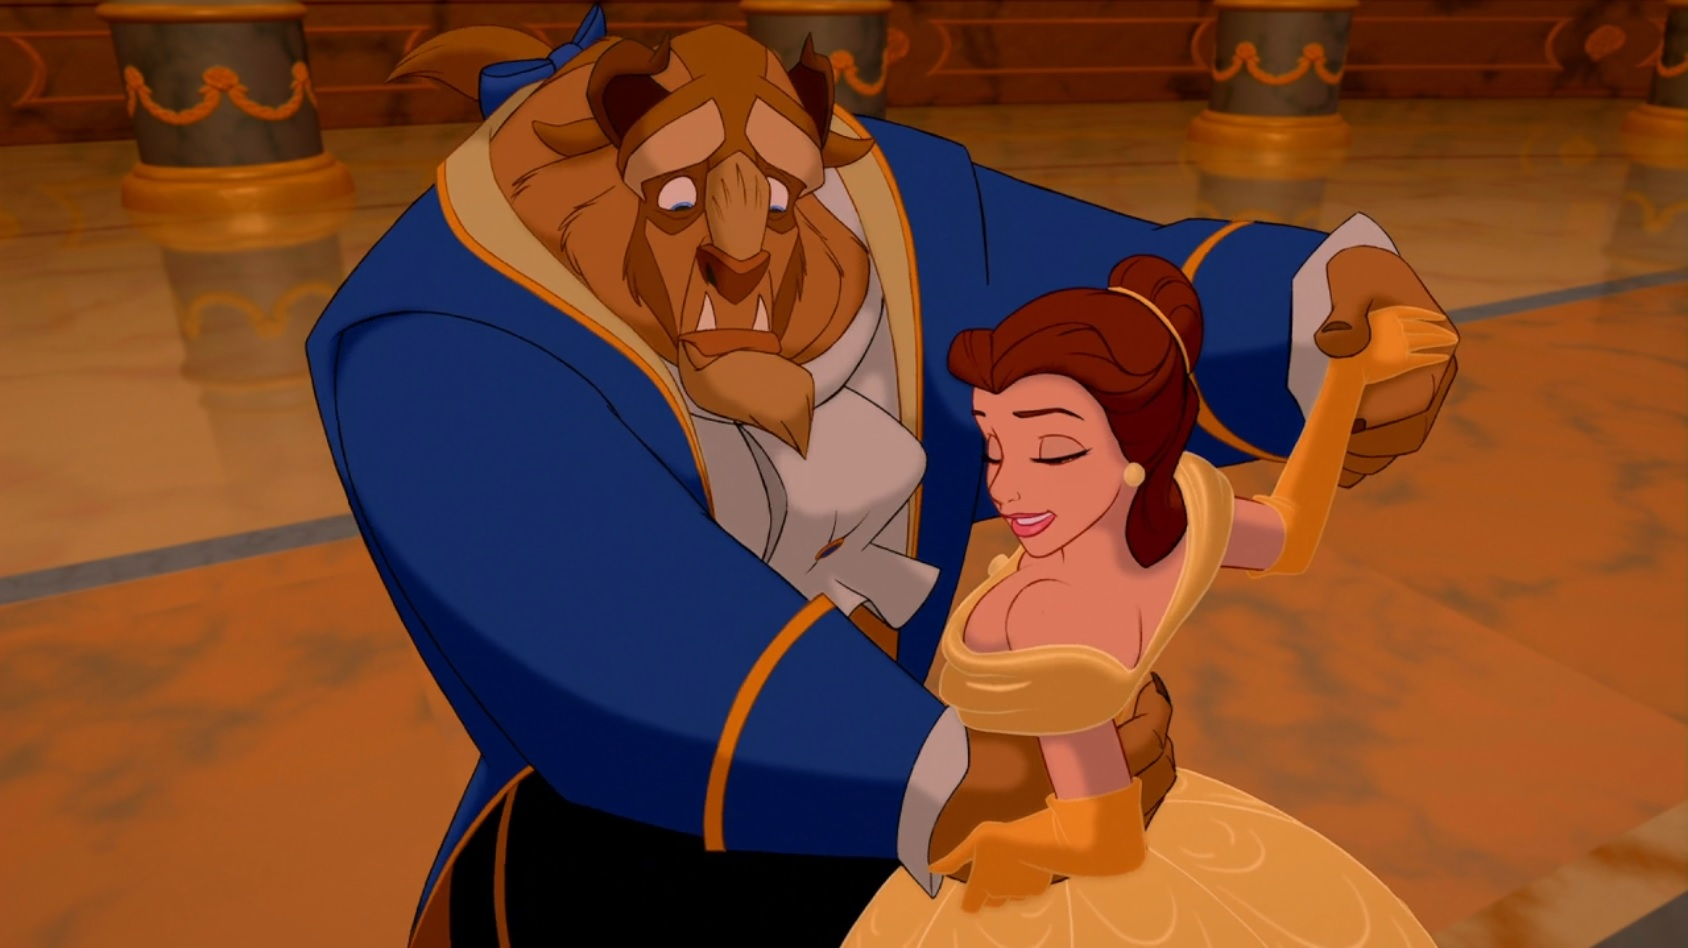 File:Belle and the Beast Dancing.jpg